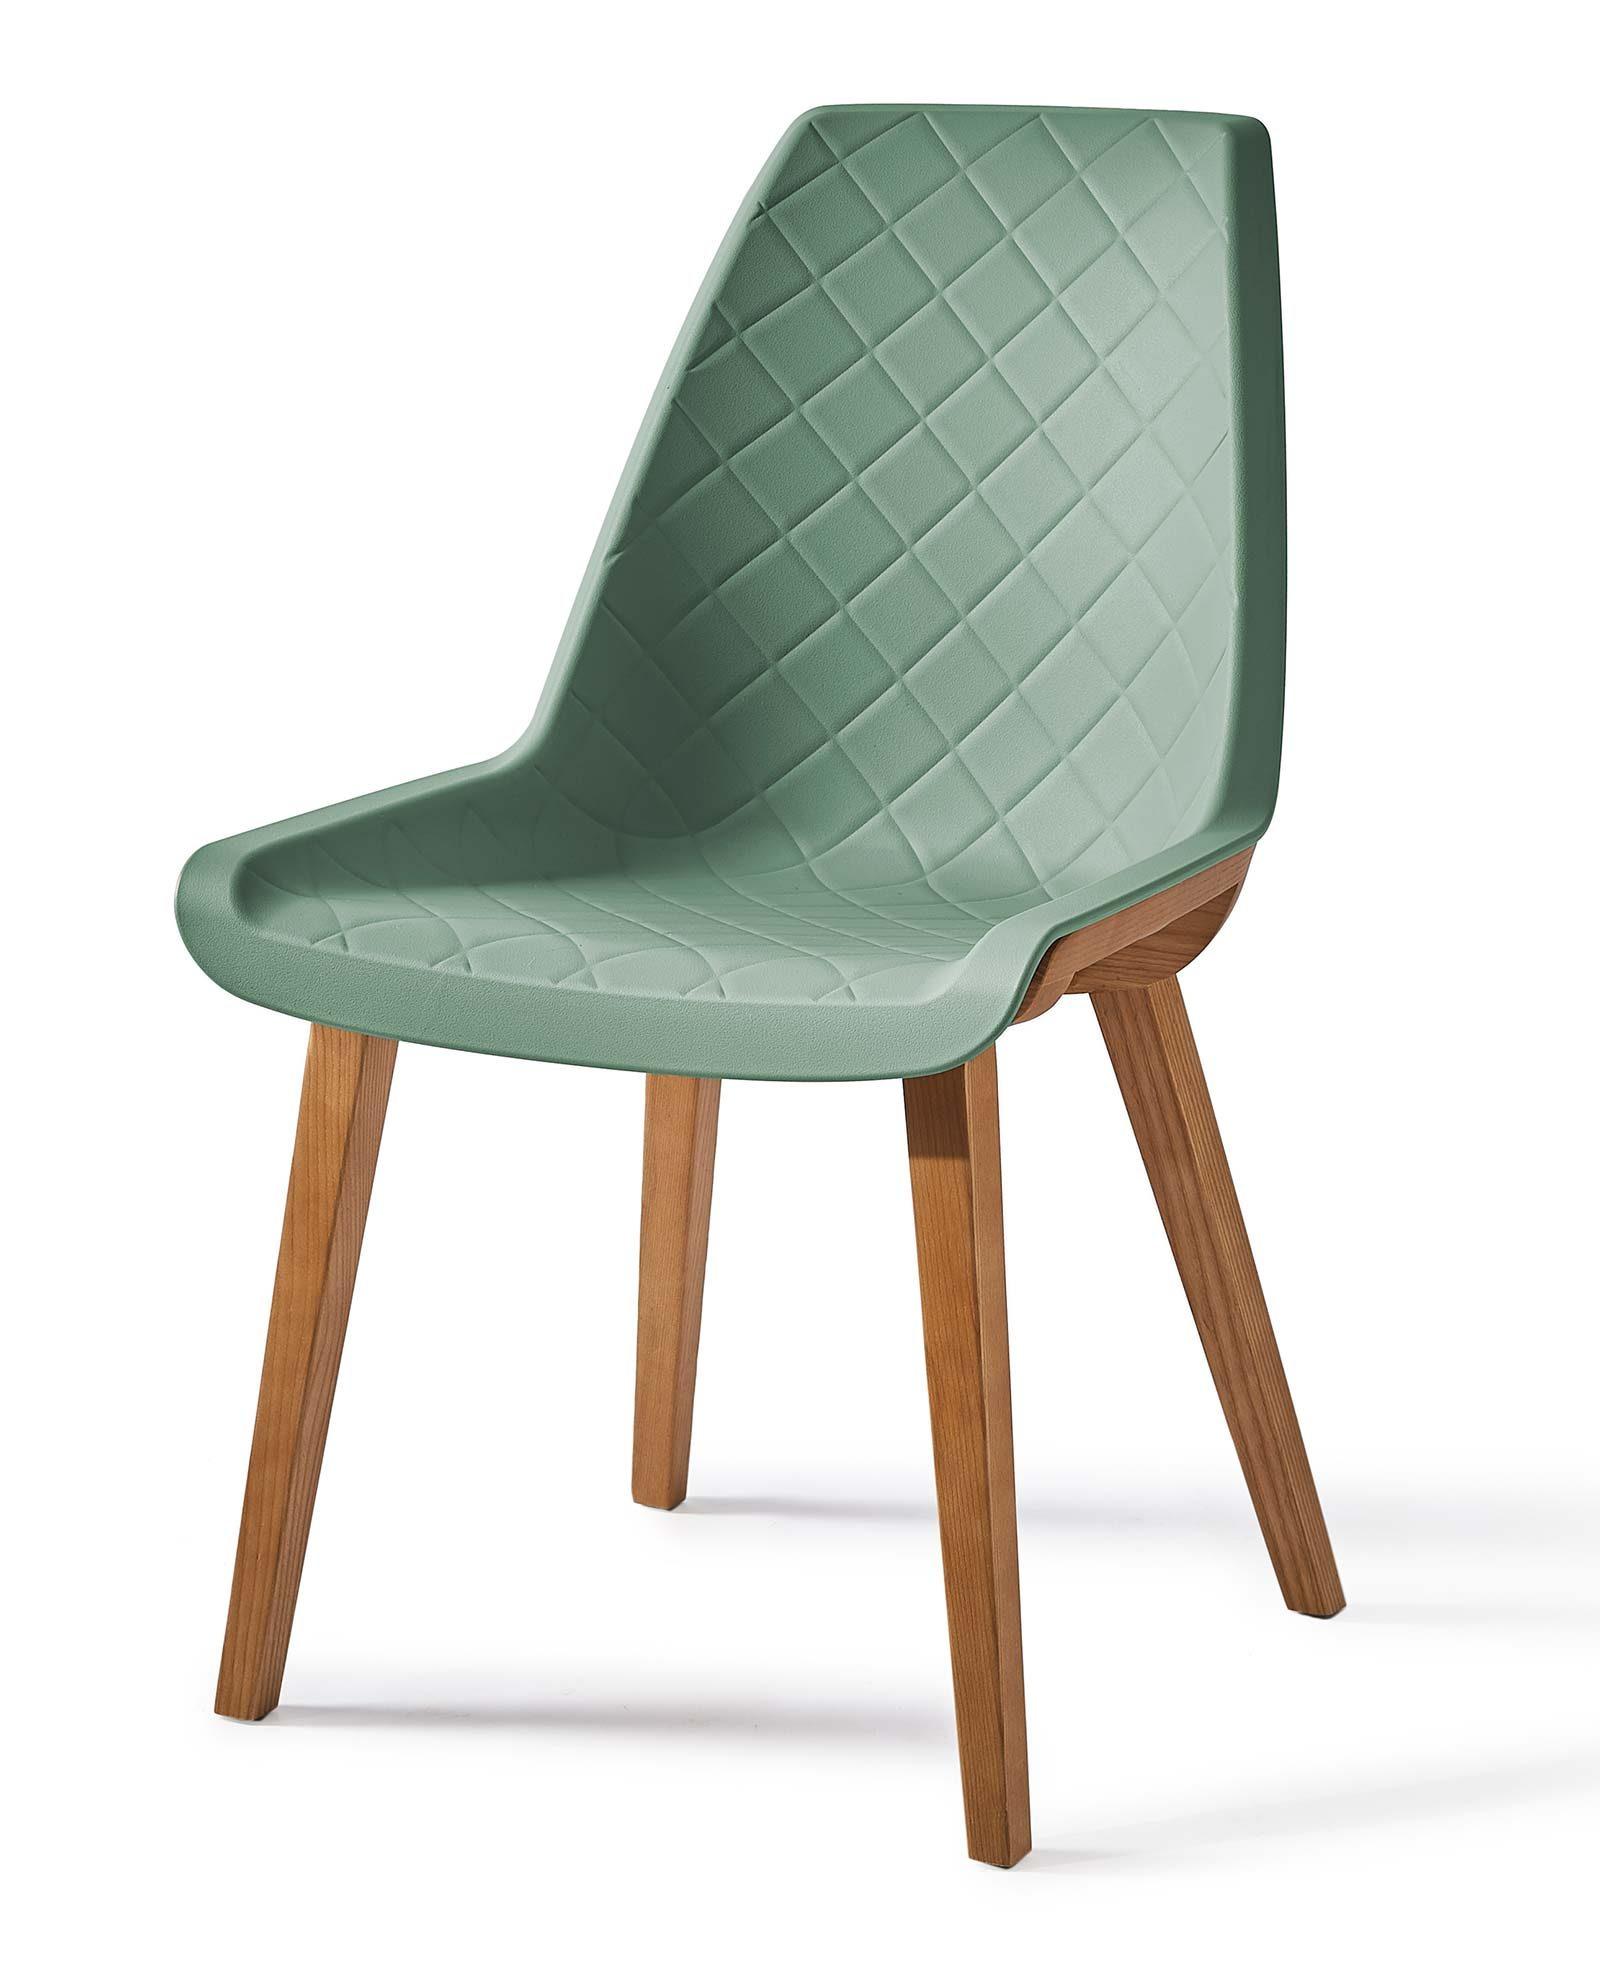 Riviera Maison dining chair Amsterdam City Green 4321003 1